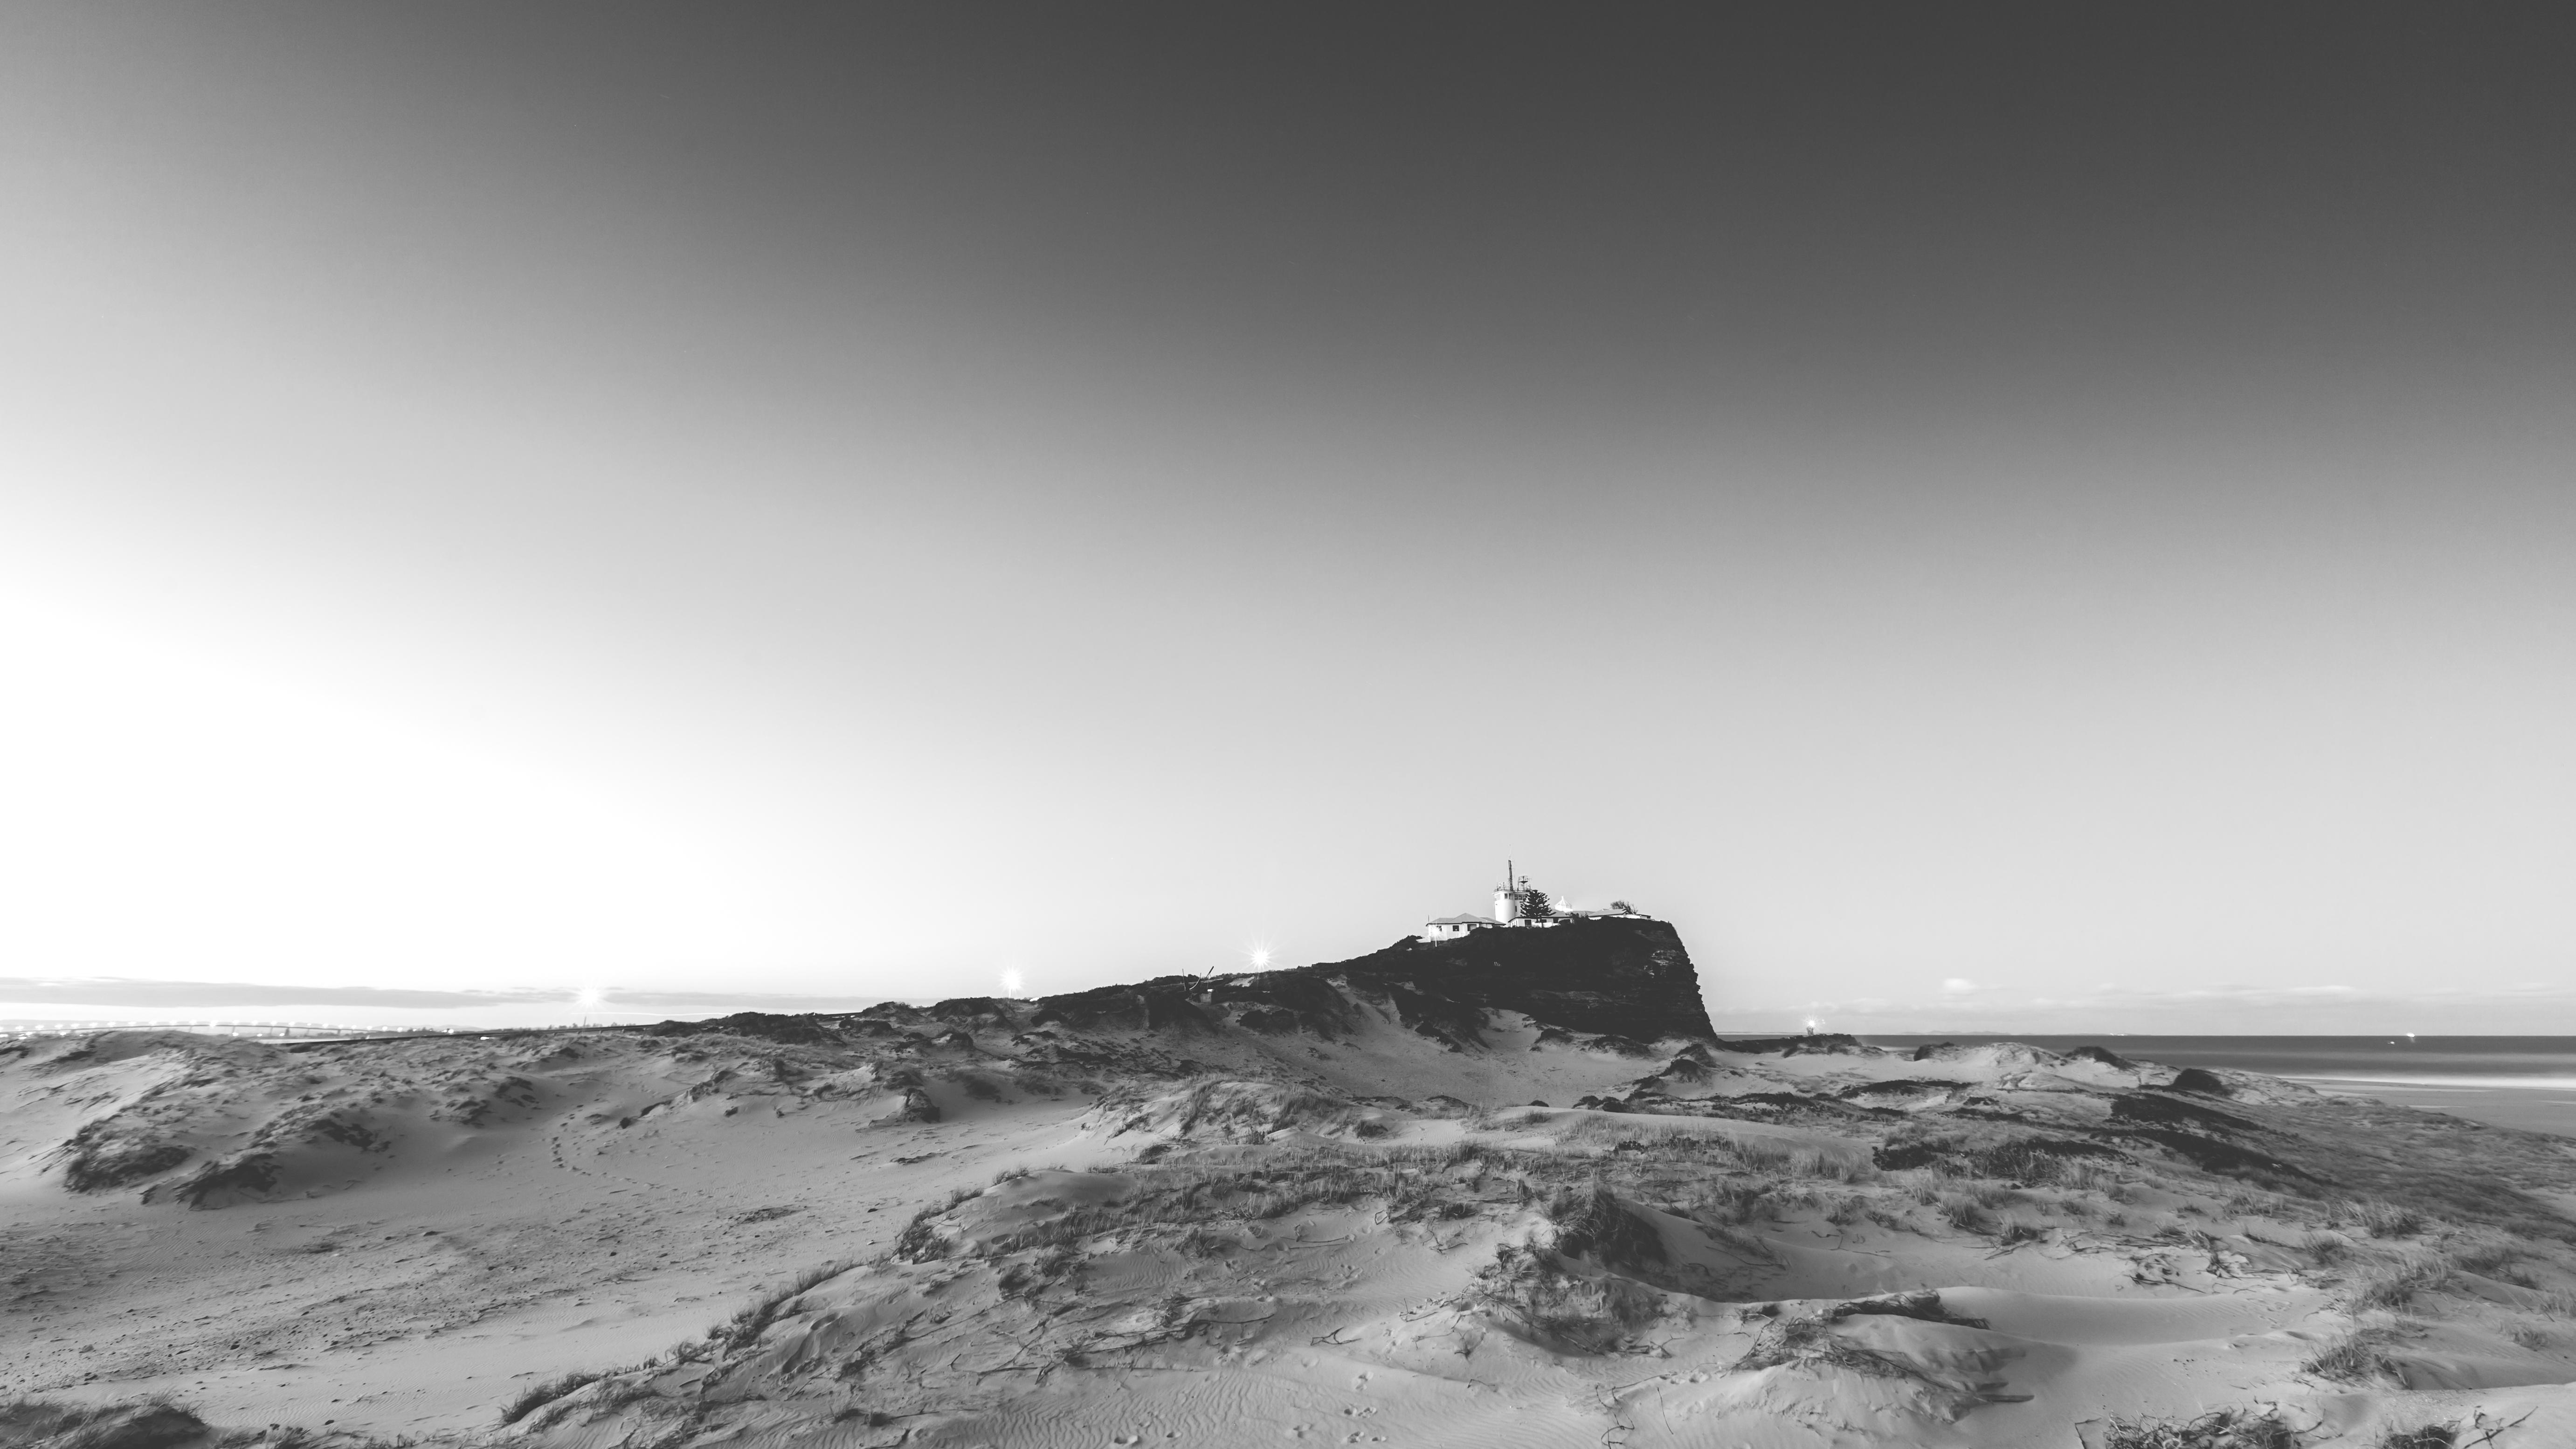 GezXavierMansfieldPhotography2015+28July2015+Landscape-36-4.jpg